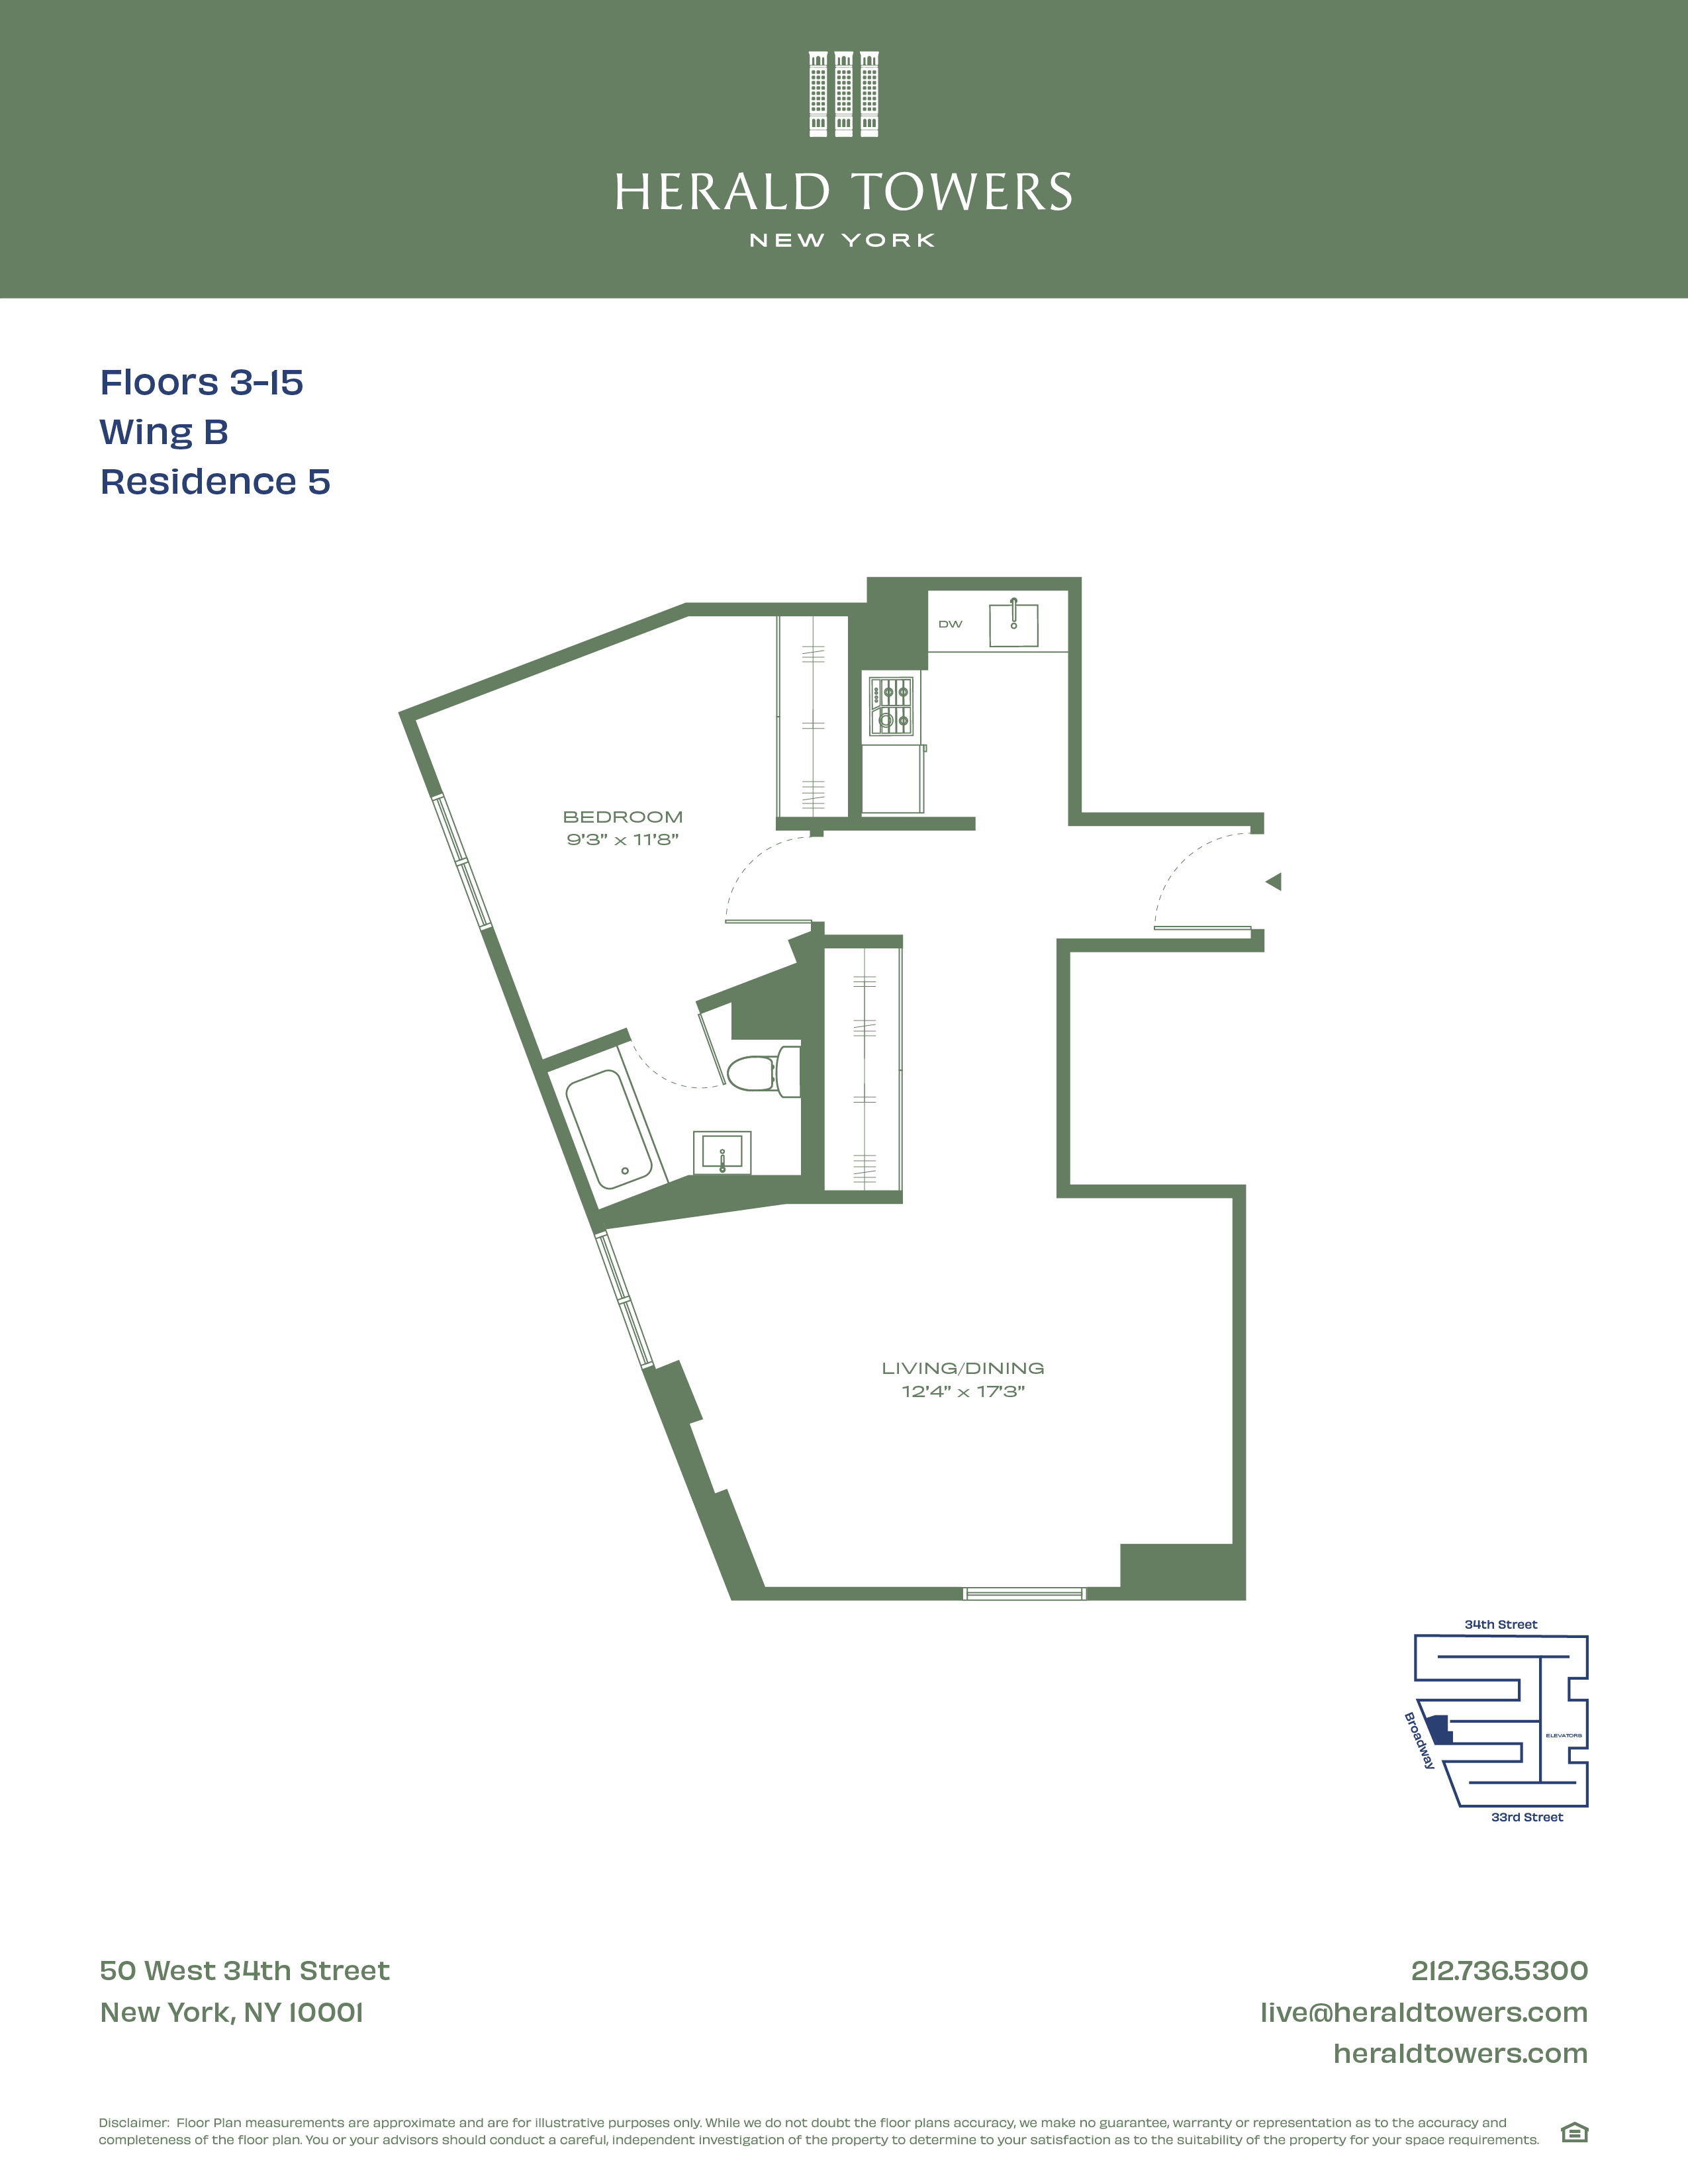 Floor plan for 12B05